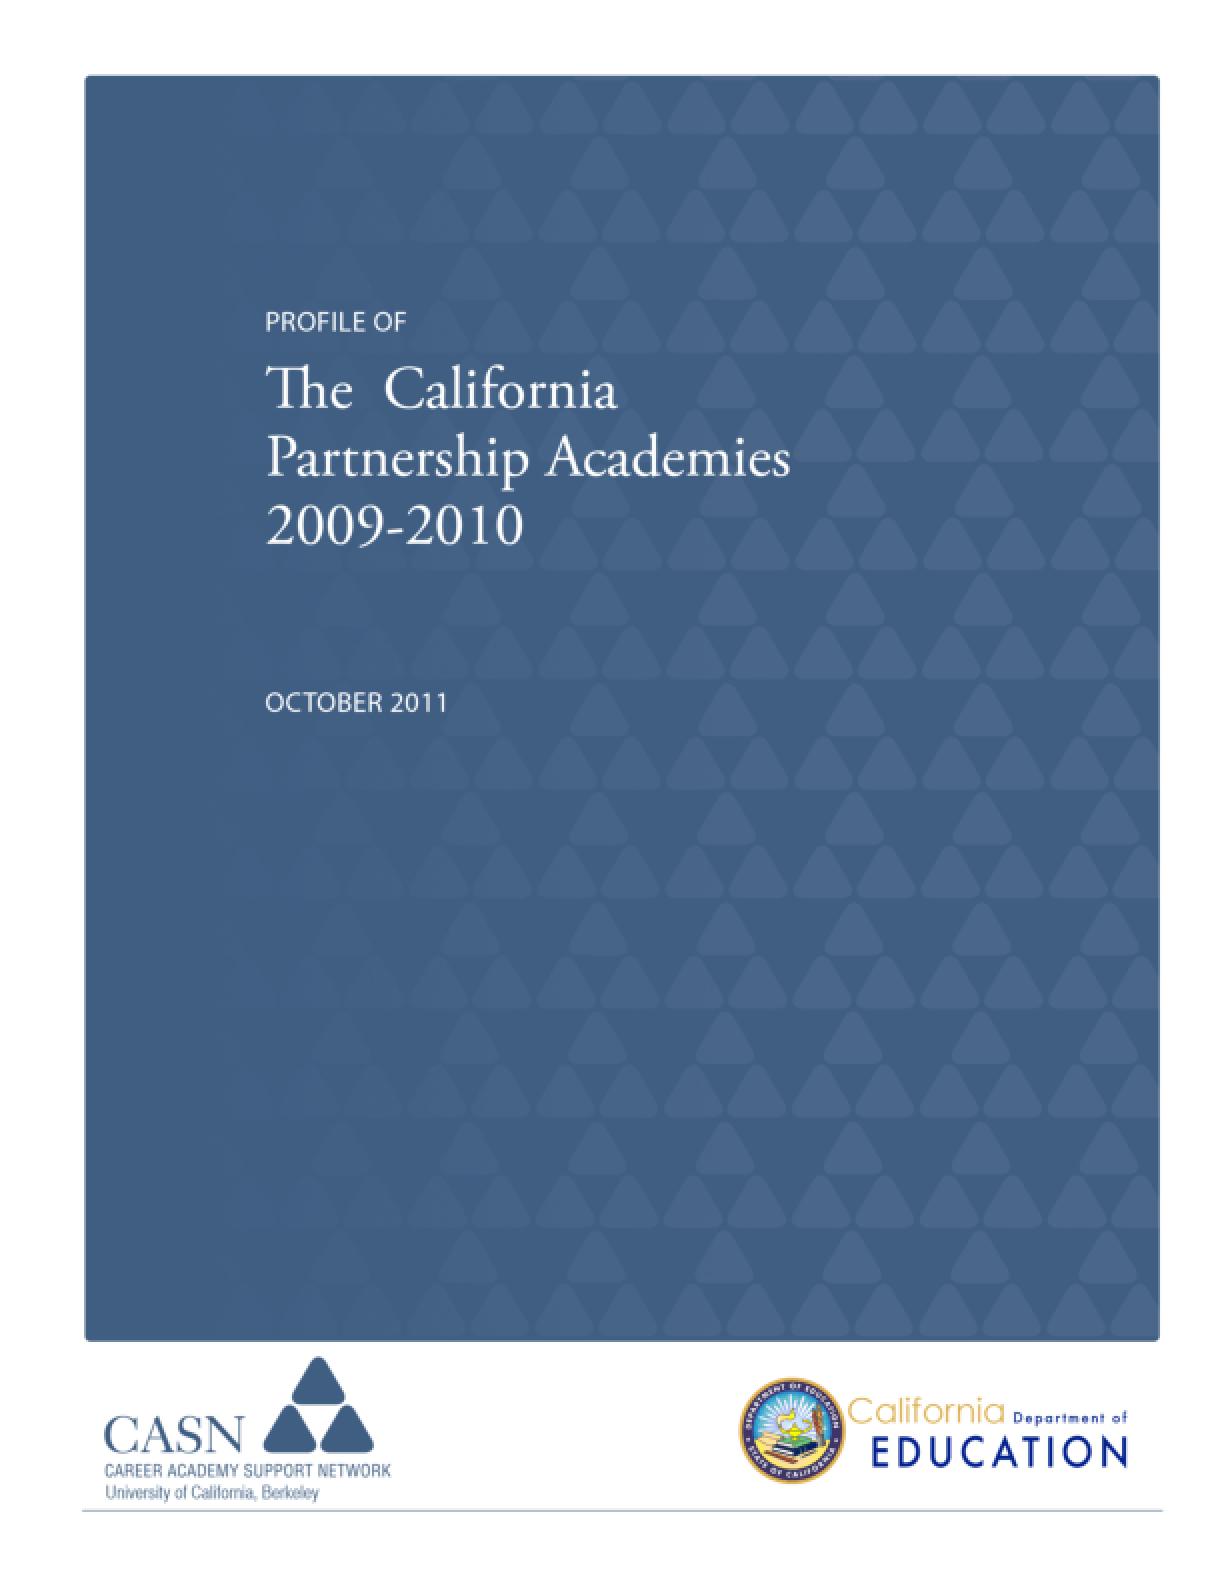 Profile of the California Partnership Academies 2009-2010